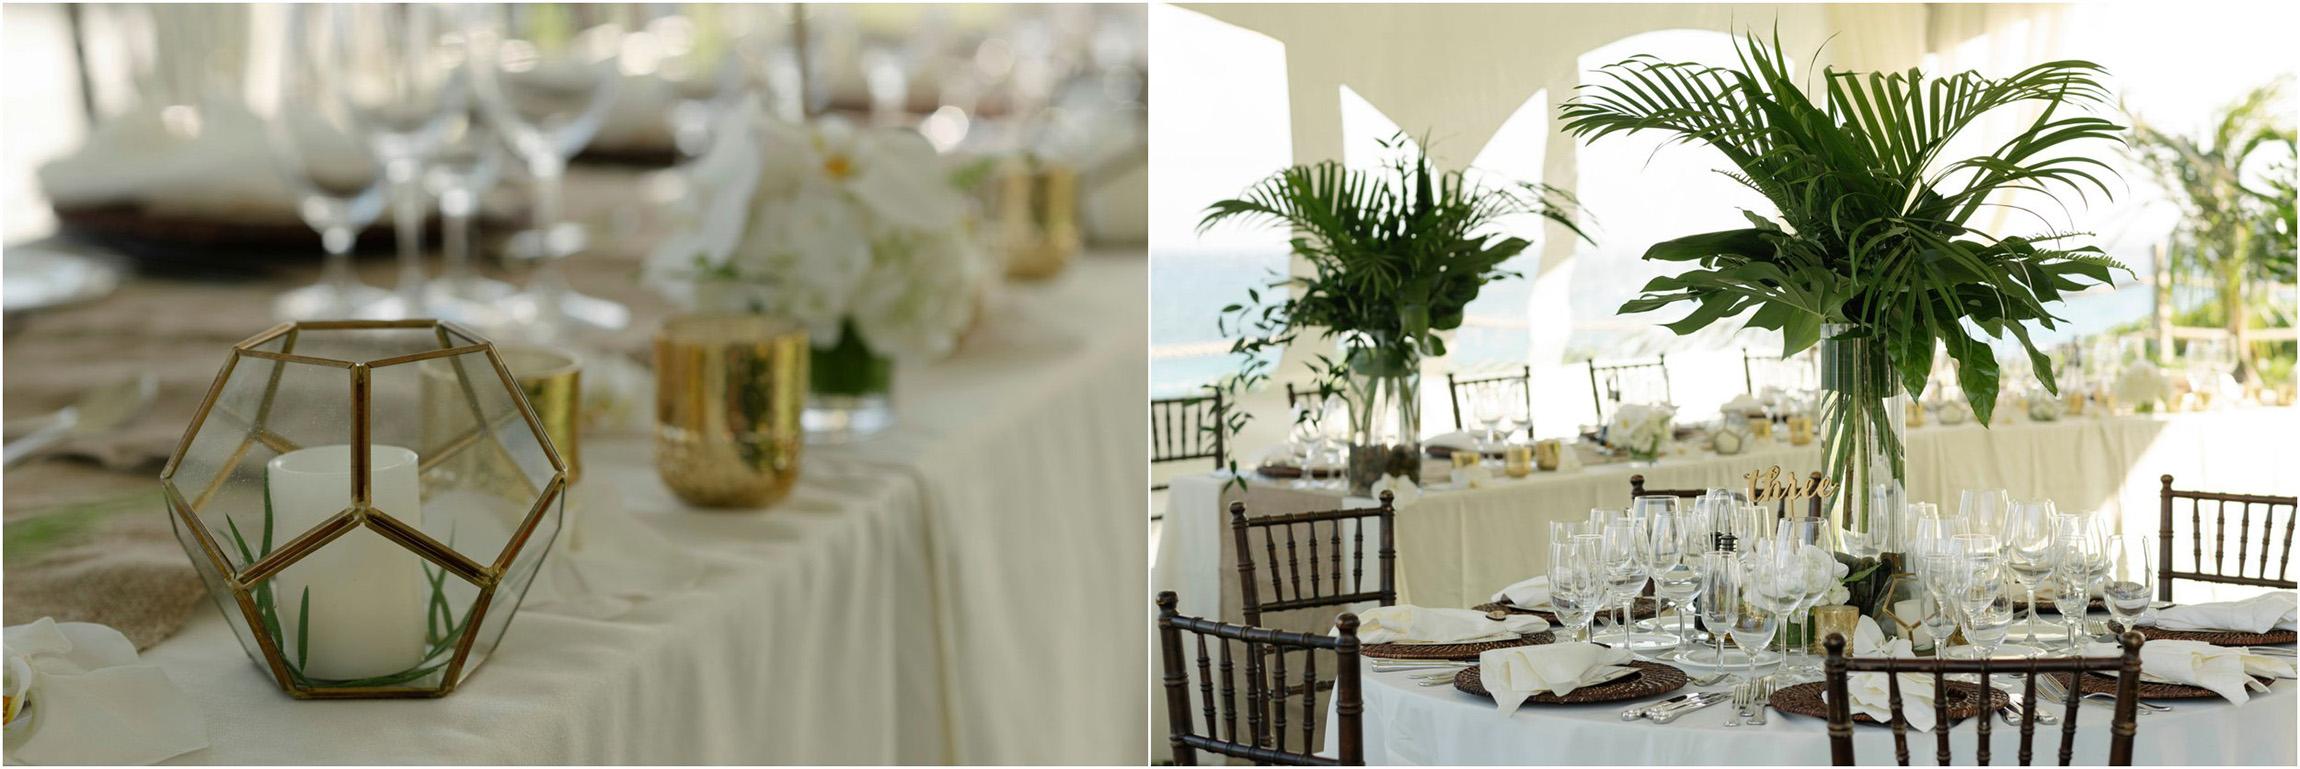 ©FianderFoto_Bermuda Wedding Photographer_Mid Ocean_Rachel_Angus_087.jpg